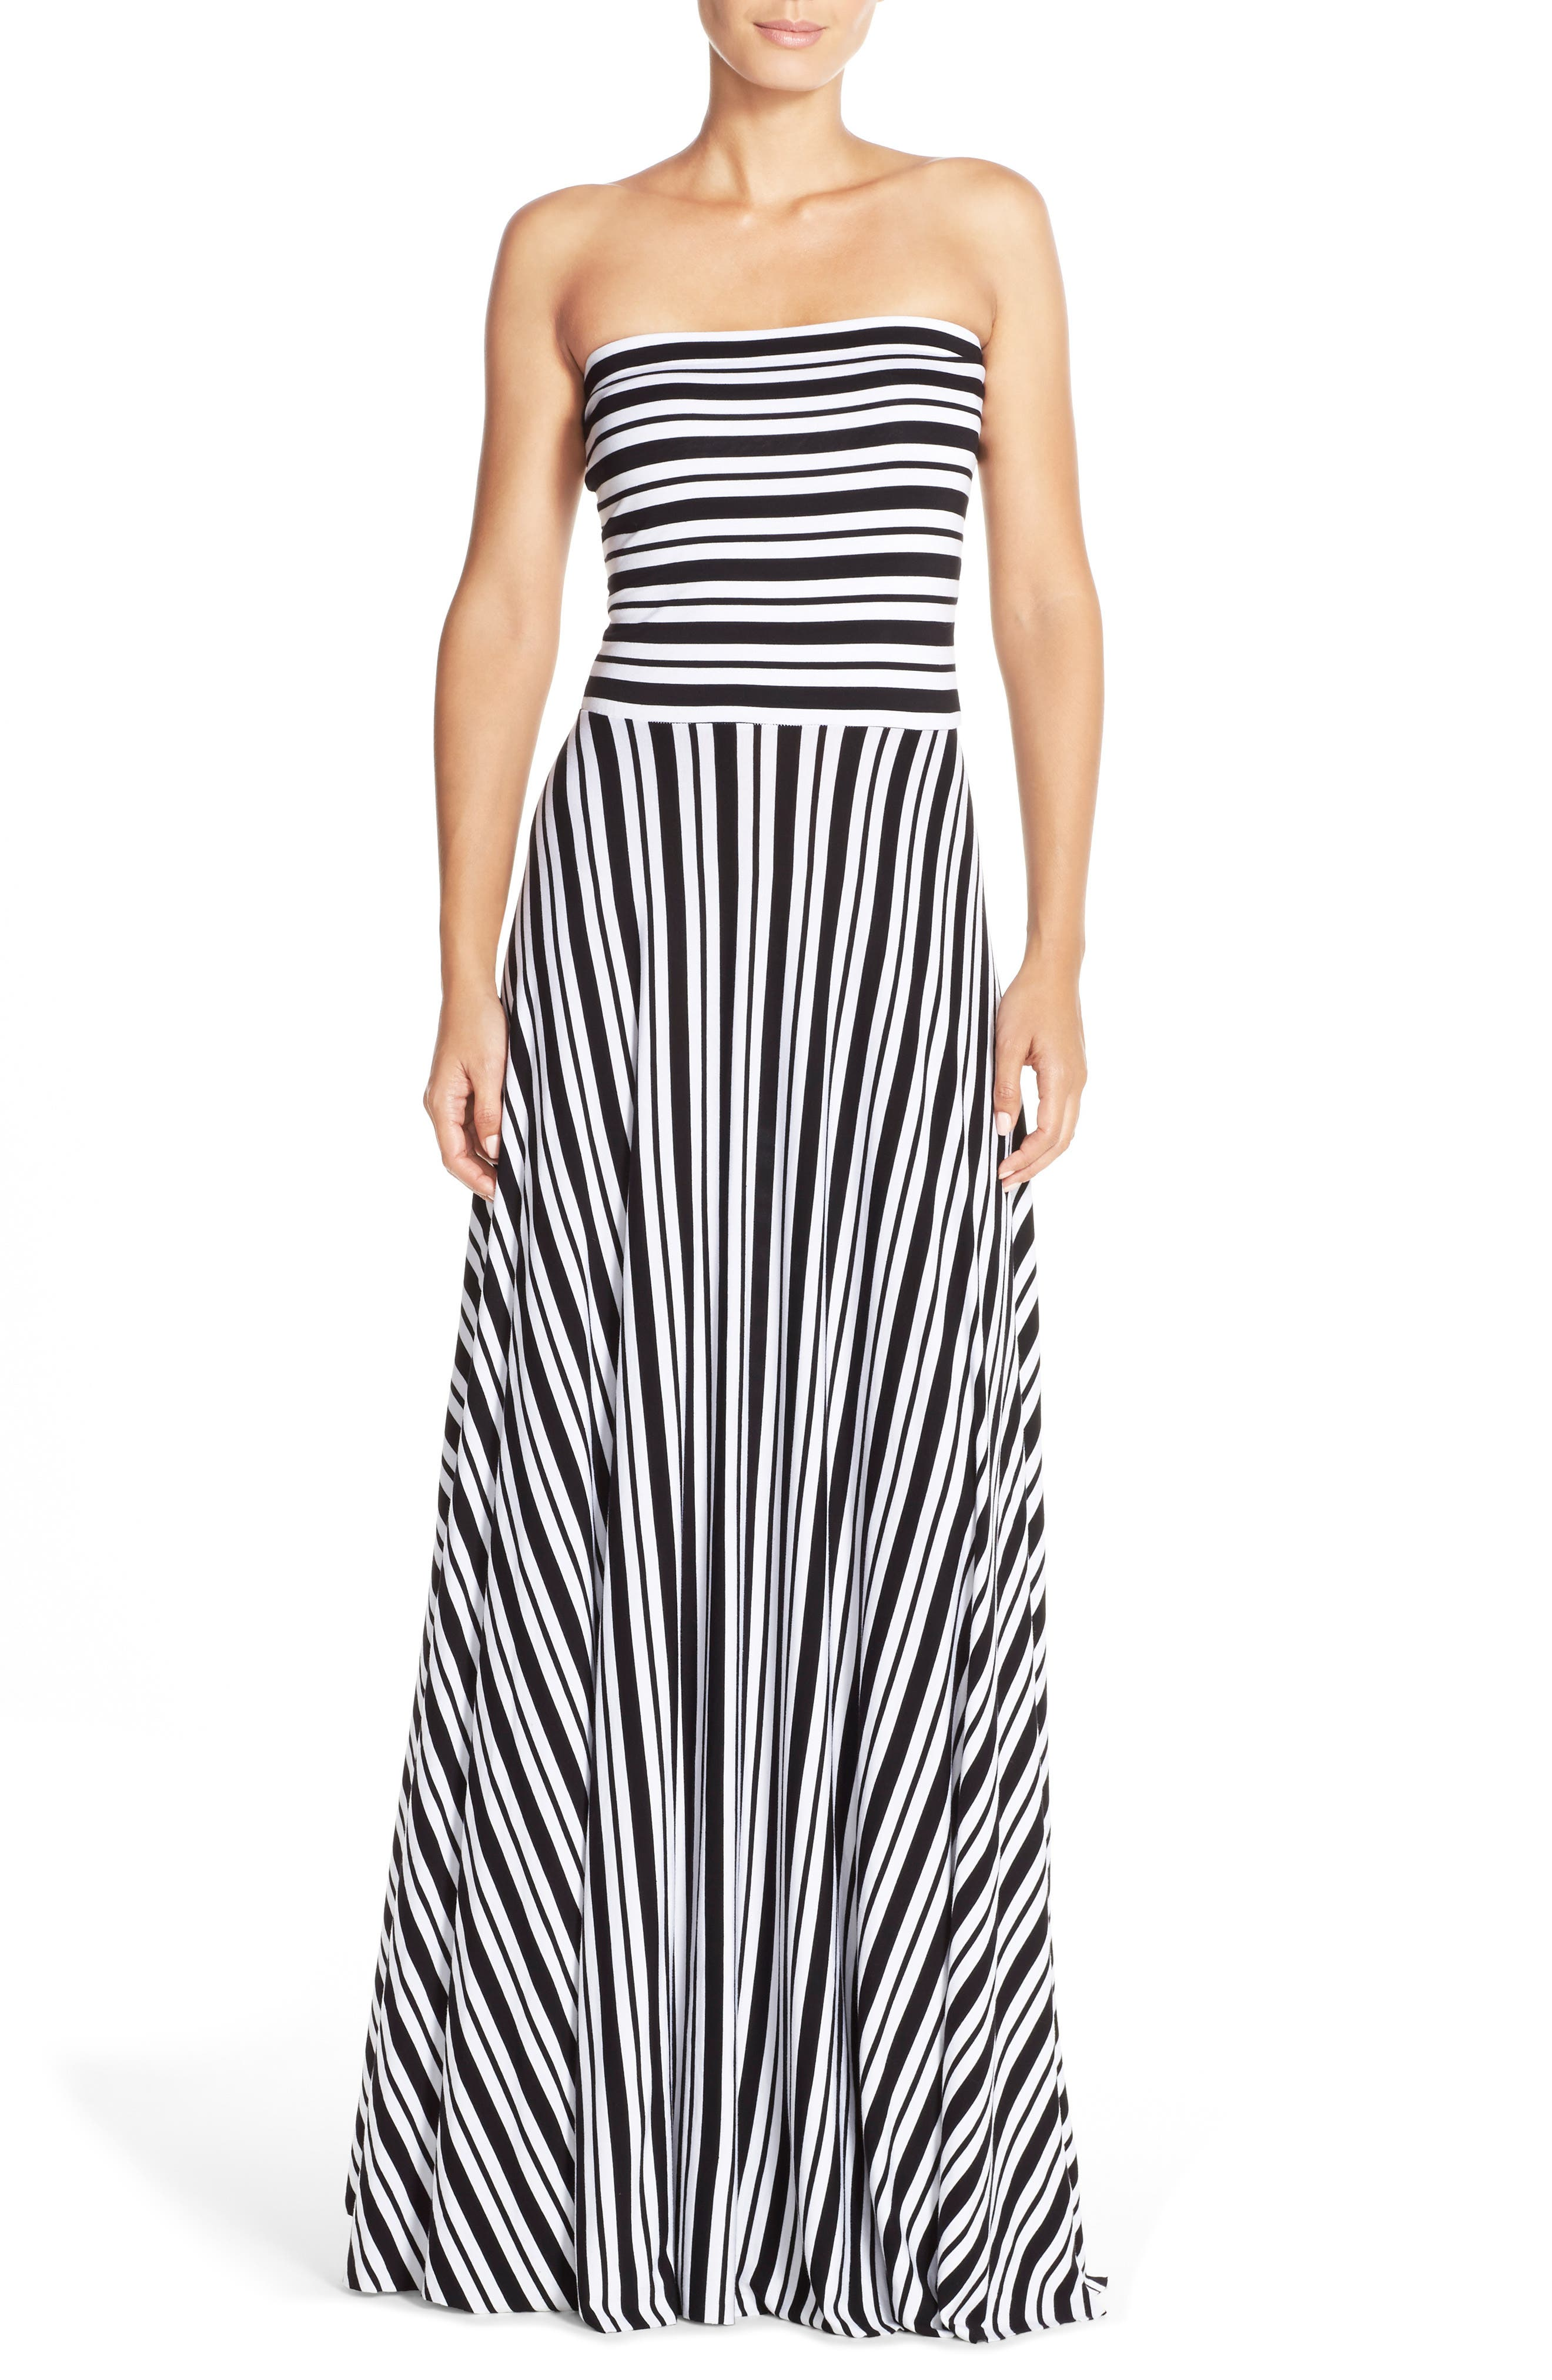 Stripe Strapless Maxi Dress,                         Main,                         color, Black/ White Stripe